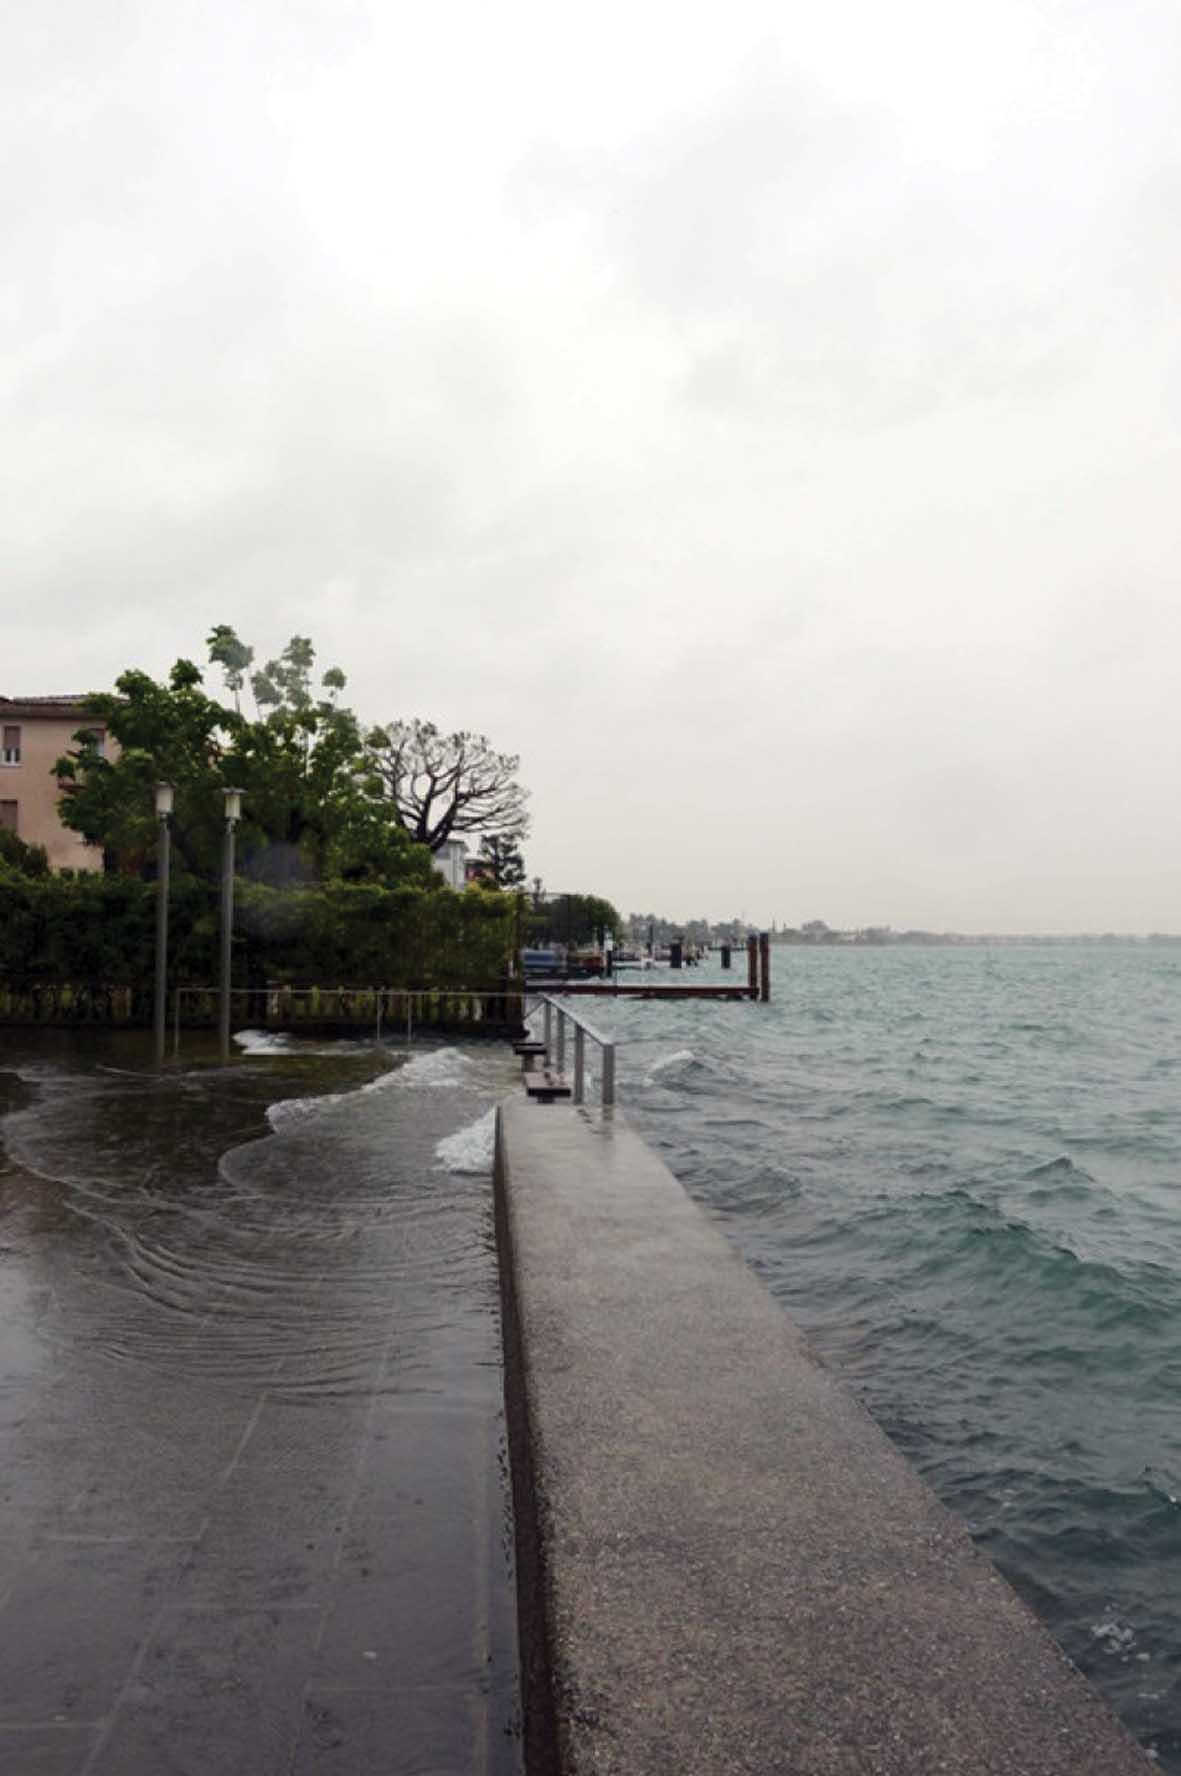 lago garda esondato Sirmione 1 1